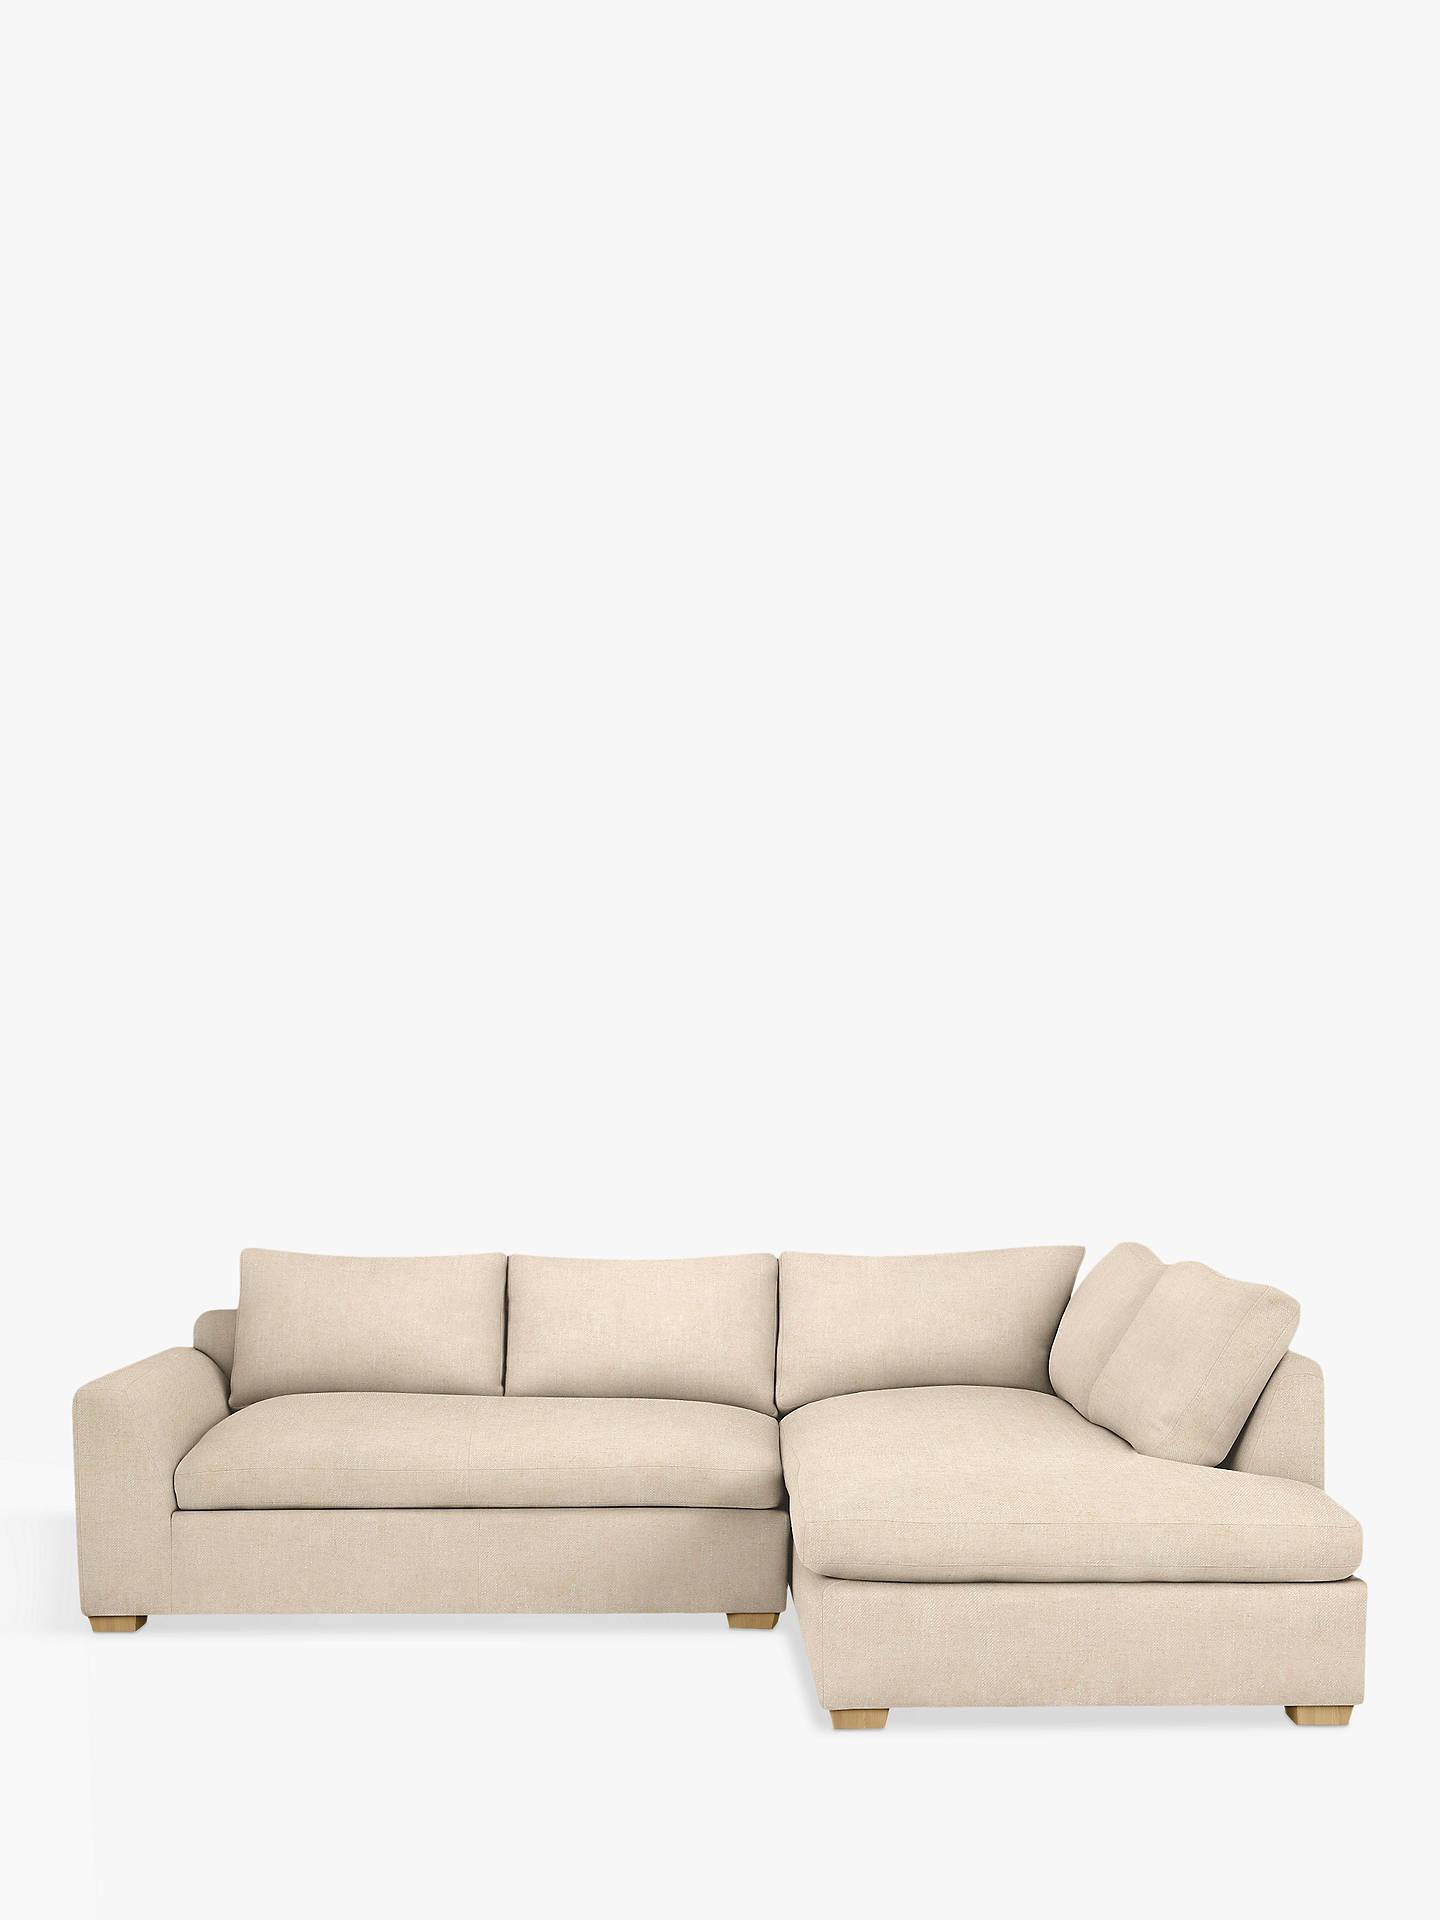 Sensational John Lewis Partners Tortona Rhf Chaise End Sofa Light Leg Maria Putty Ncnpc Chair Design For Home Ncnpcorg